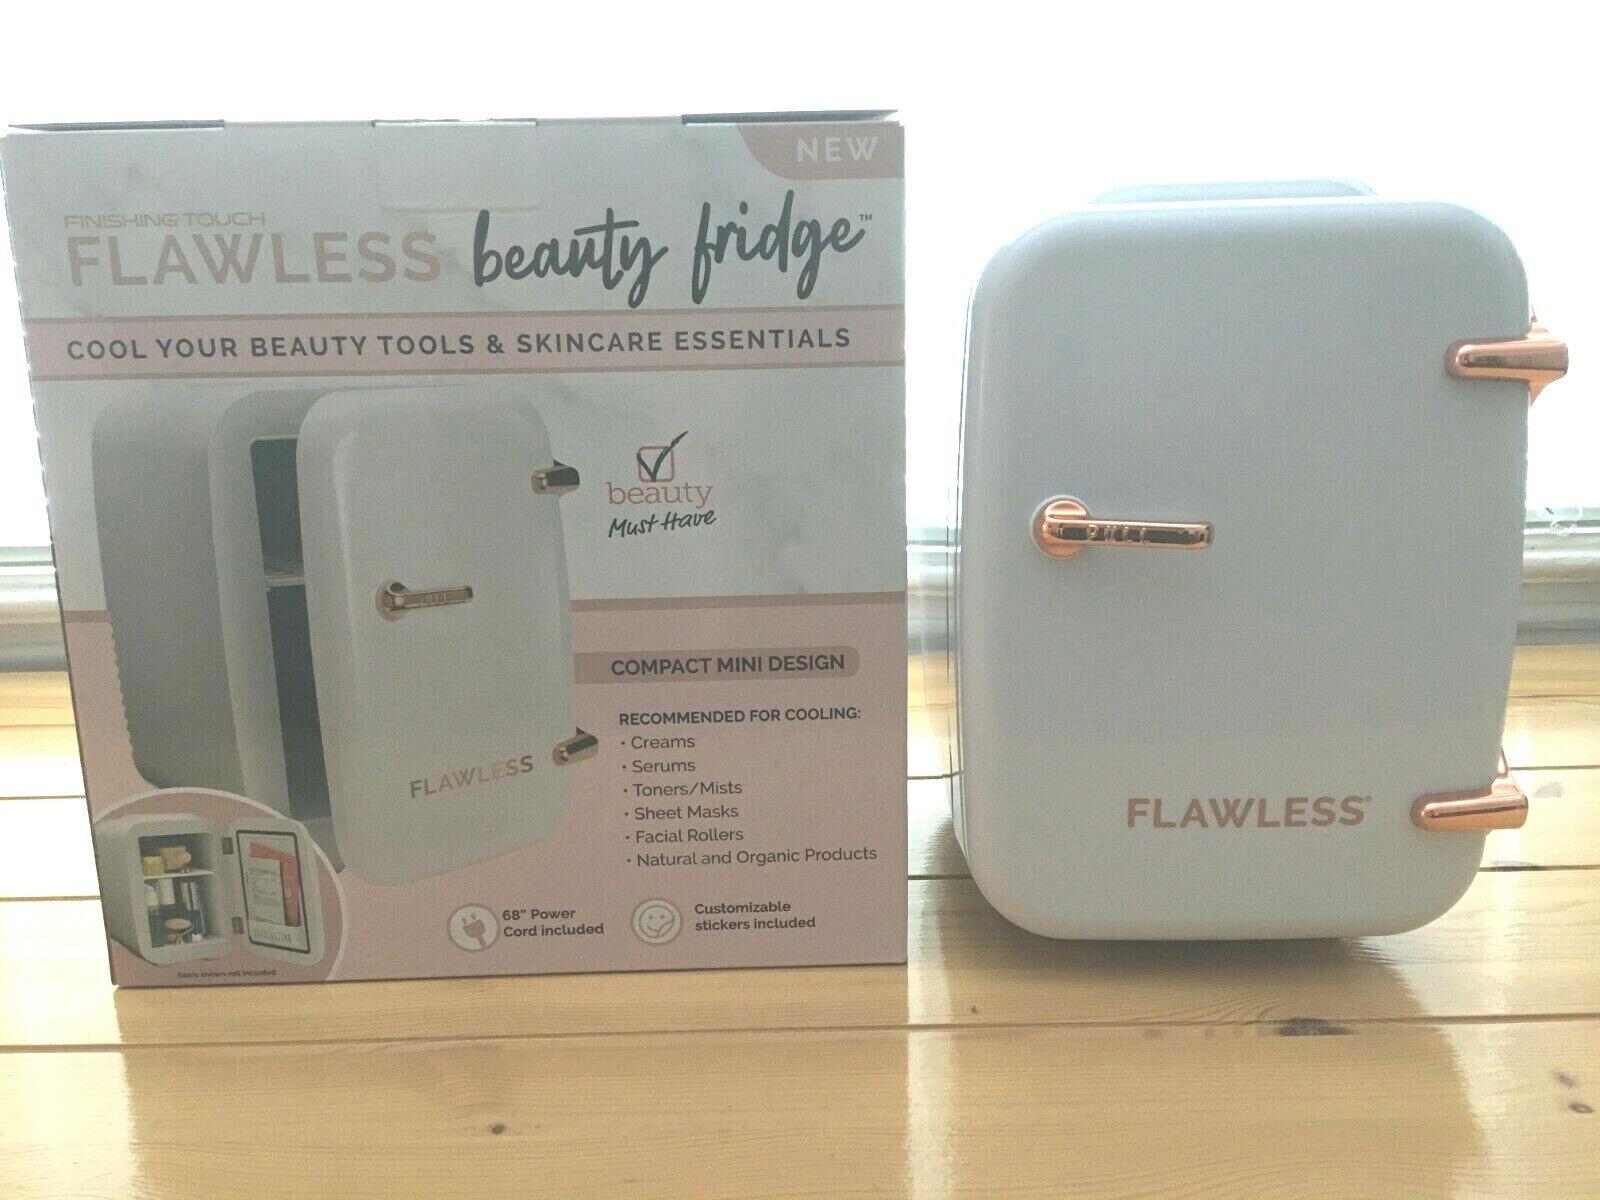 Finishing Touch Flawless Beauty Fridge Makeup Skincare Refri